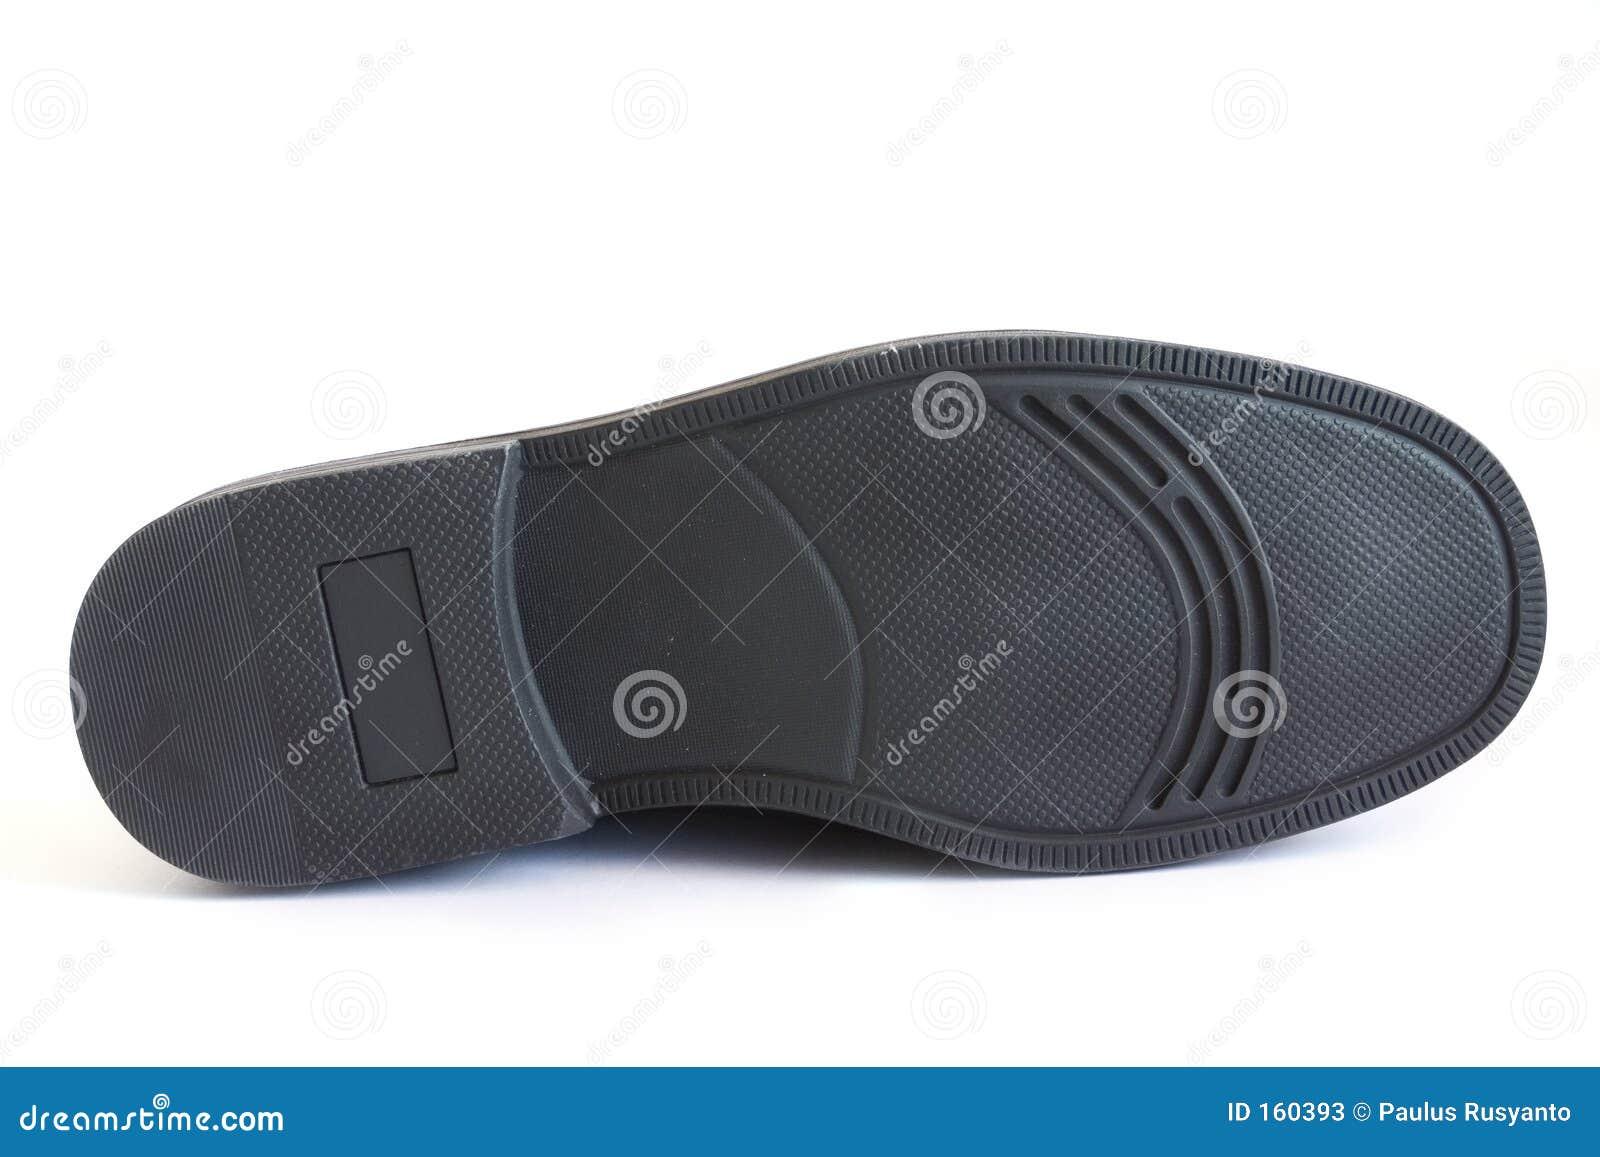 Isolated shoe